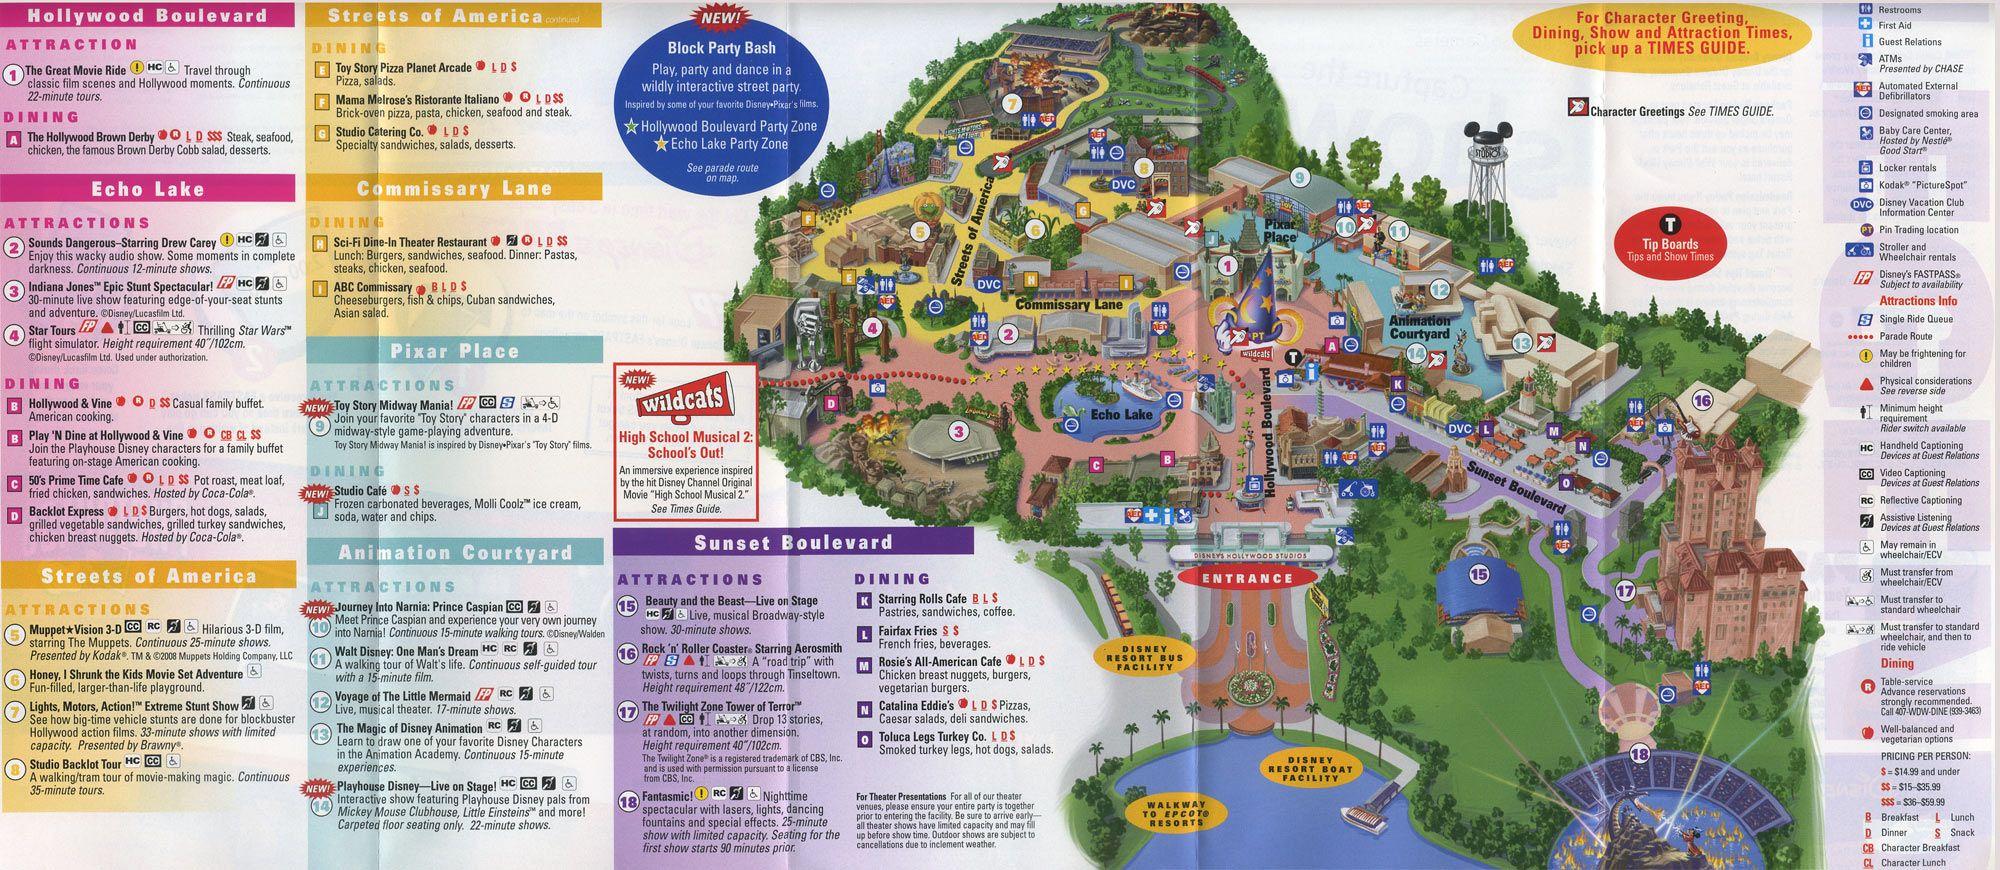 Disney World Park And Resort Maps Disney 39 S Hollywood Studios Map